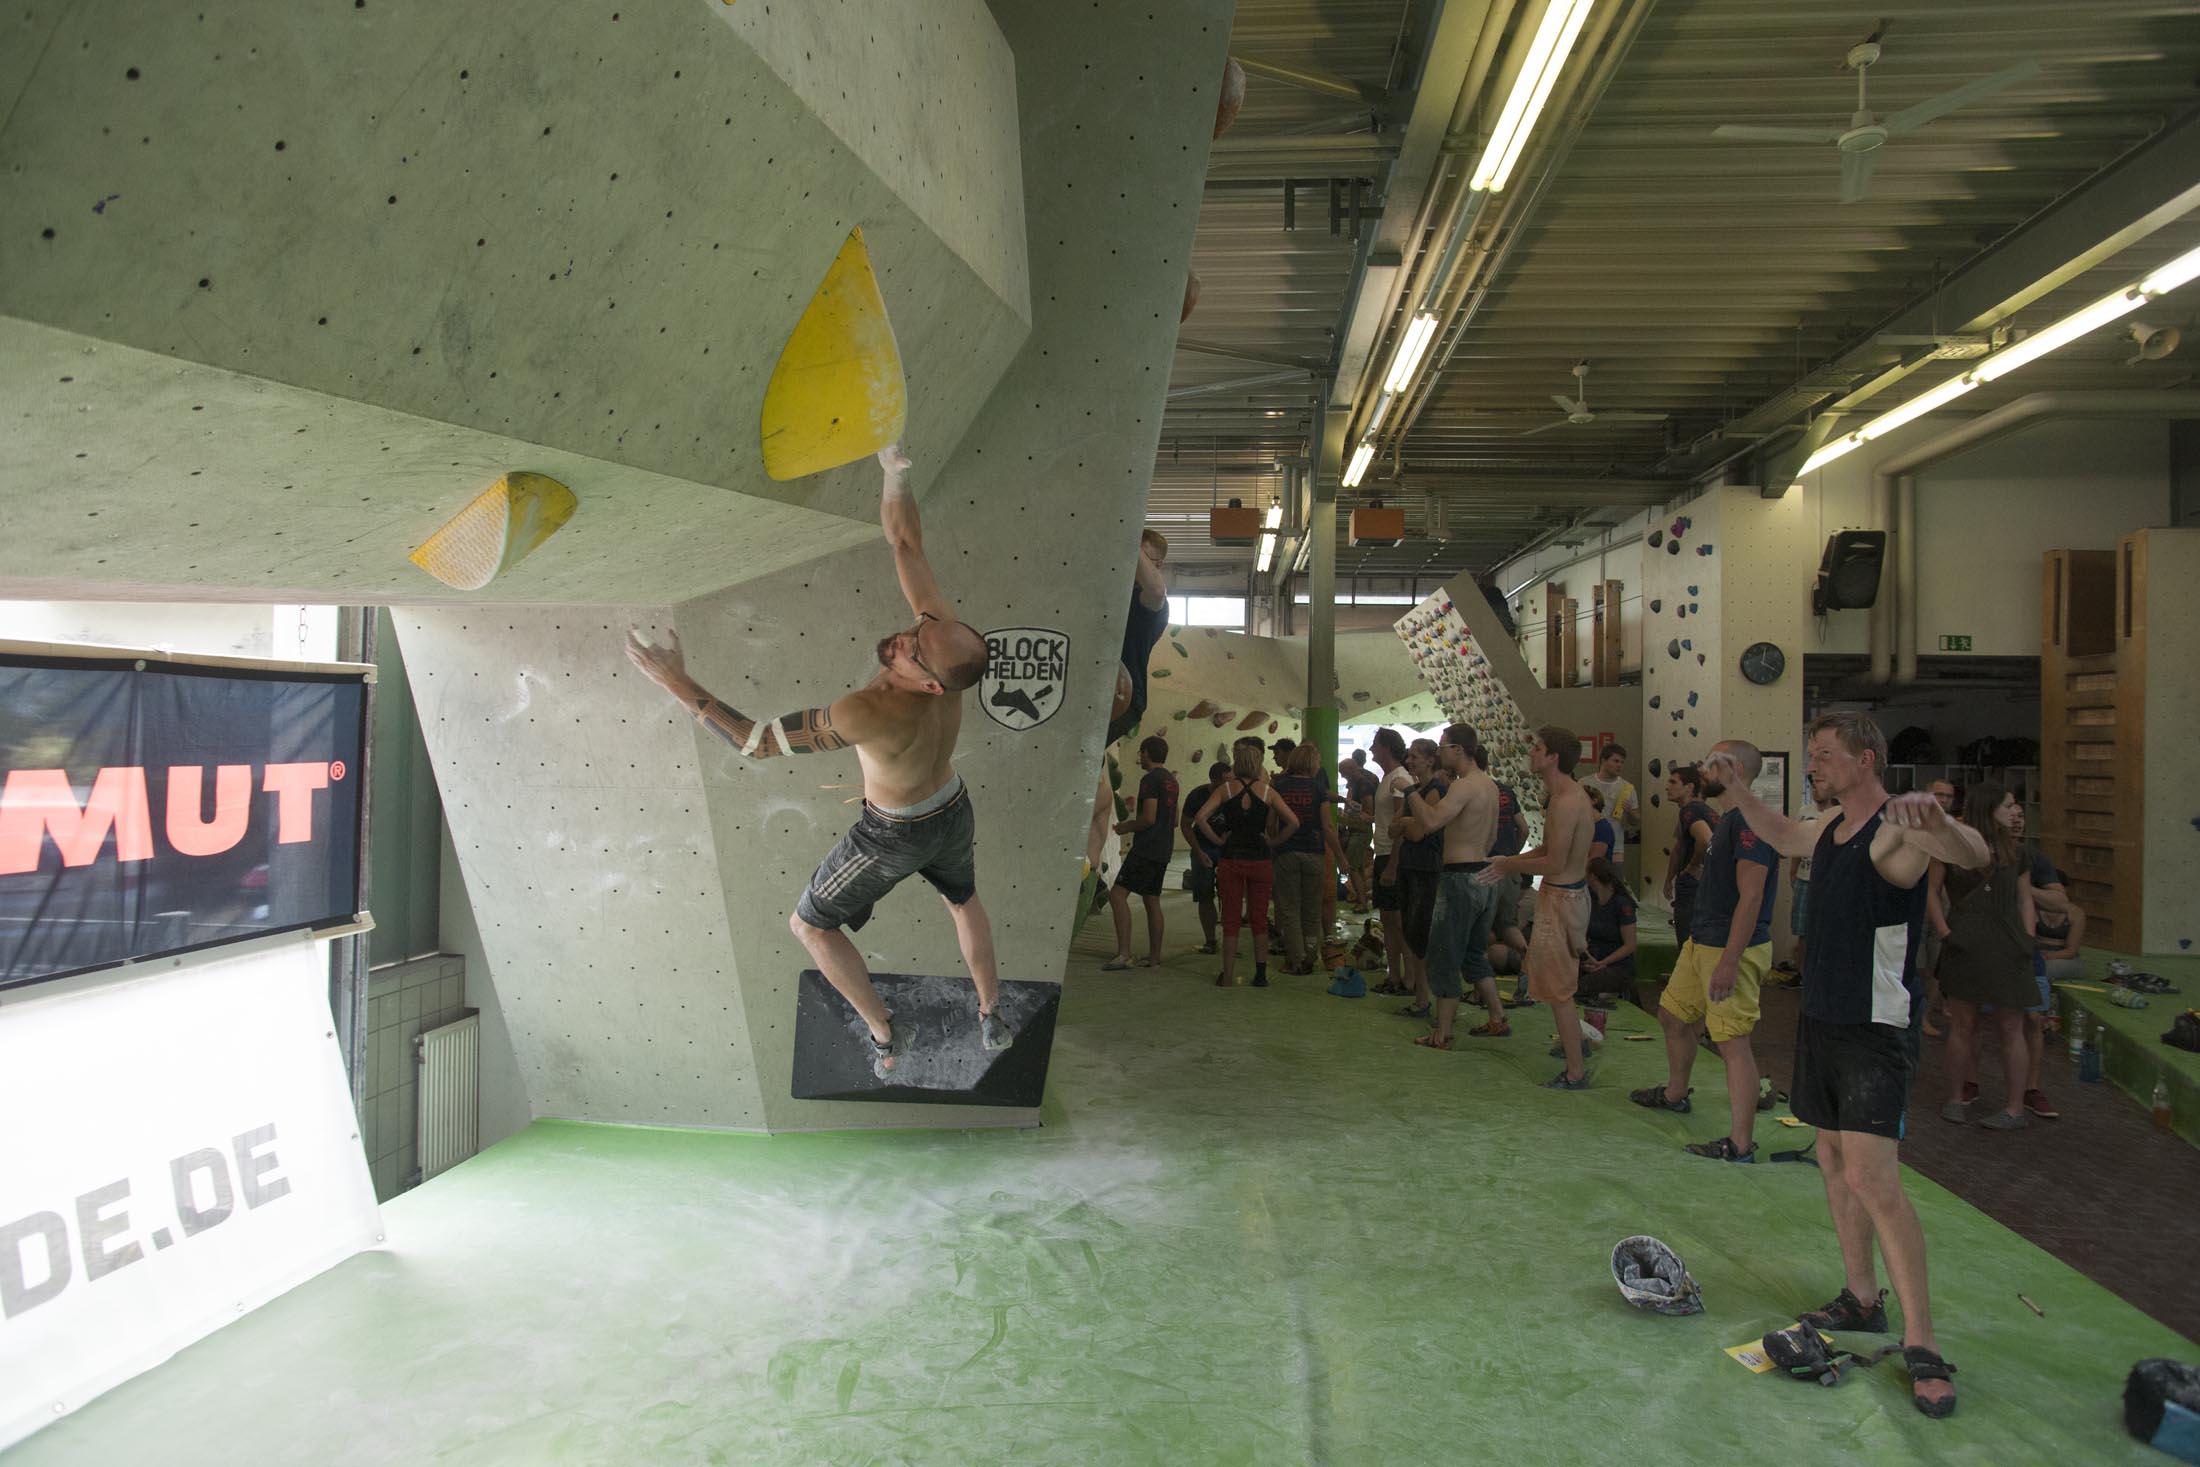 Quali, internationaler bouldercup Frankenjura 2016, BLOCKHELDEN Erlangen, Mammut, Bergfreunde.de, Boulderwettkampf07092016399